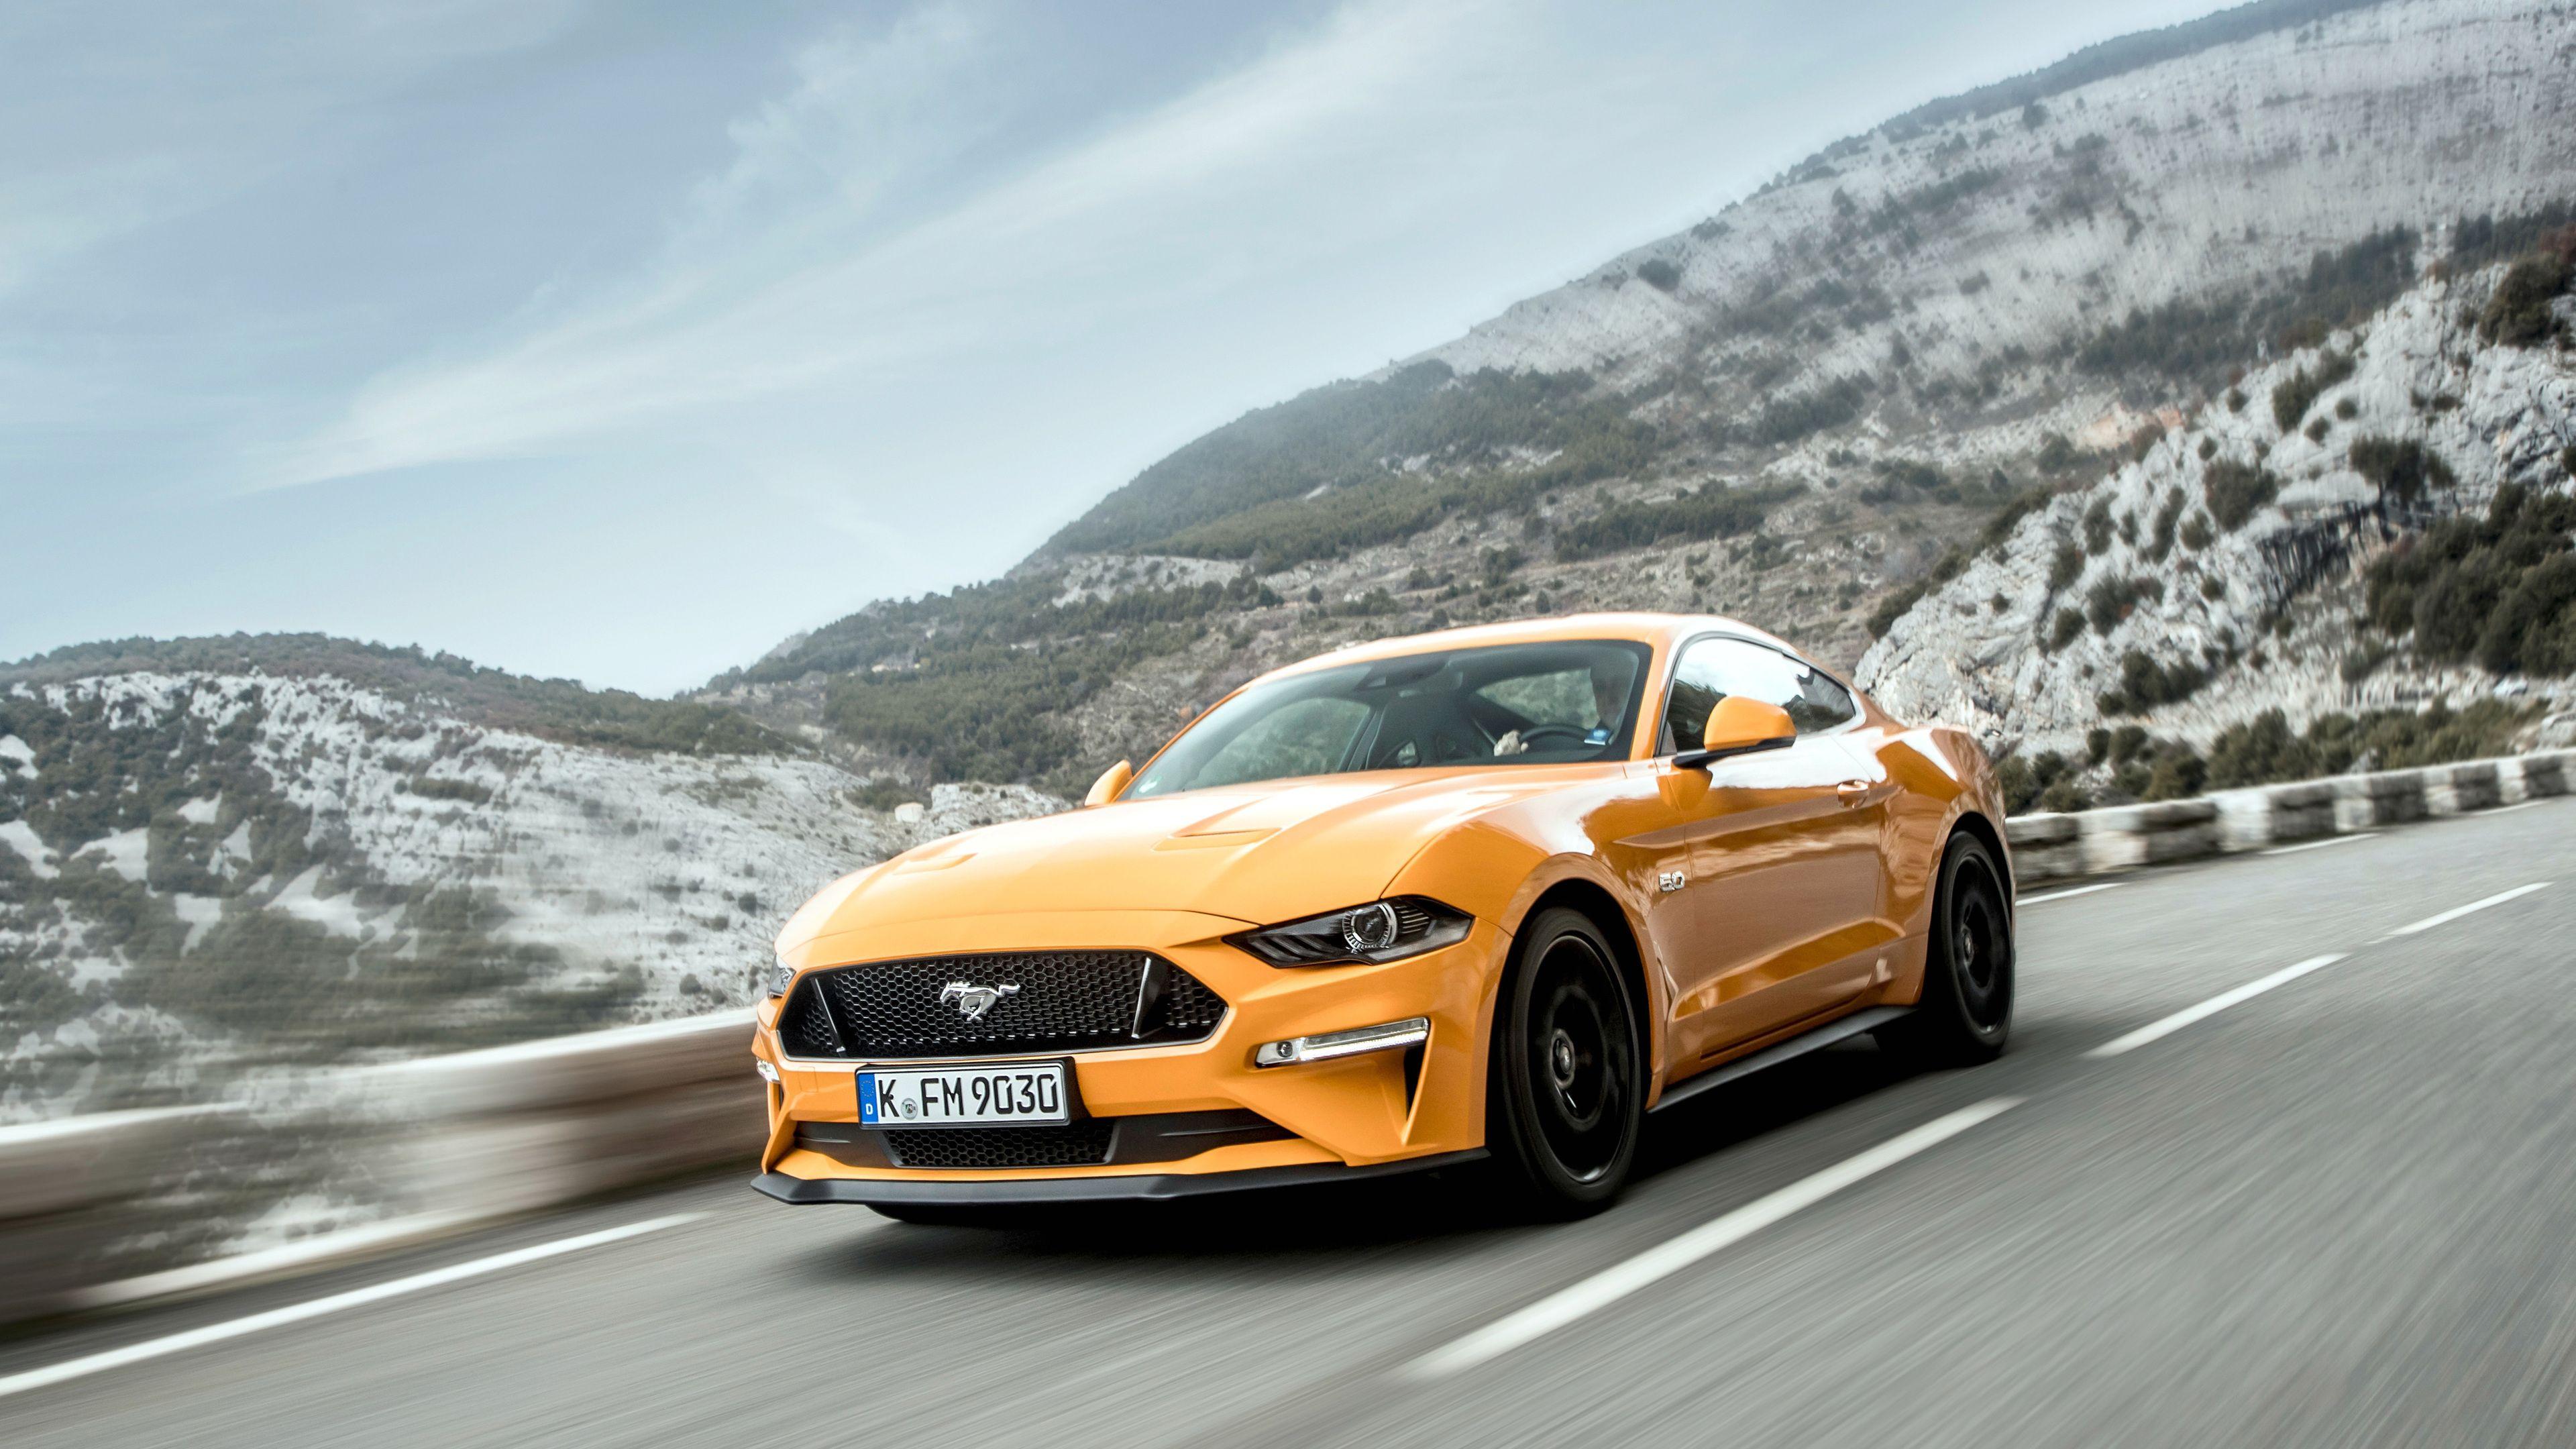 Wallpaper 4k Ford Mustang Gt Fastback 2018 Cars Wallpapers 4k